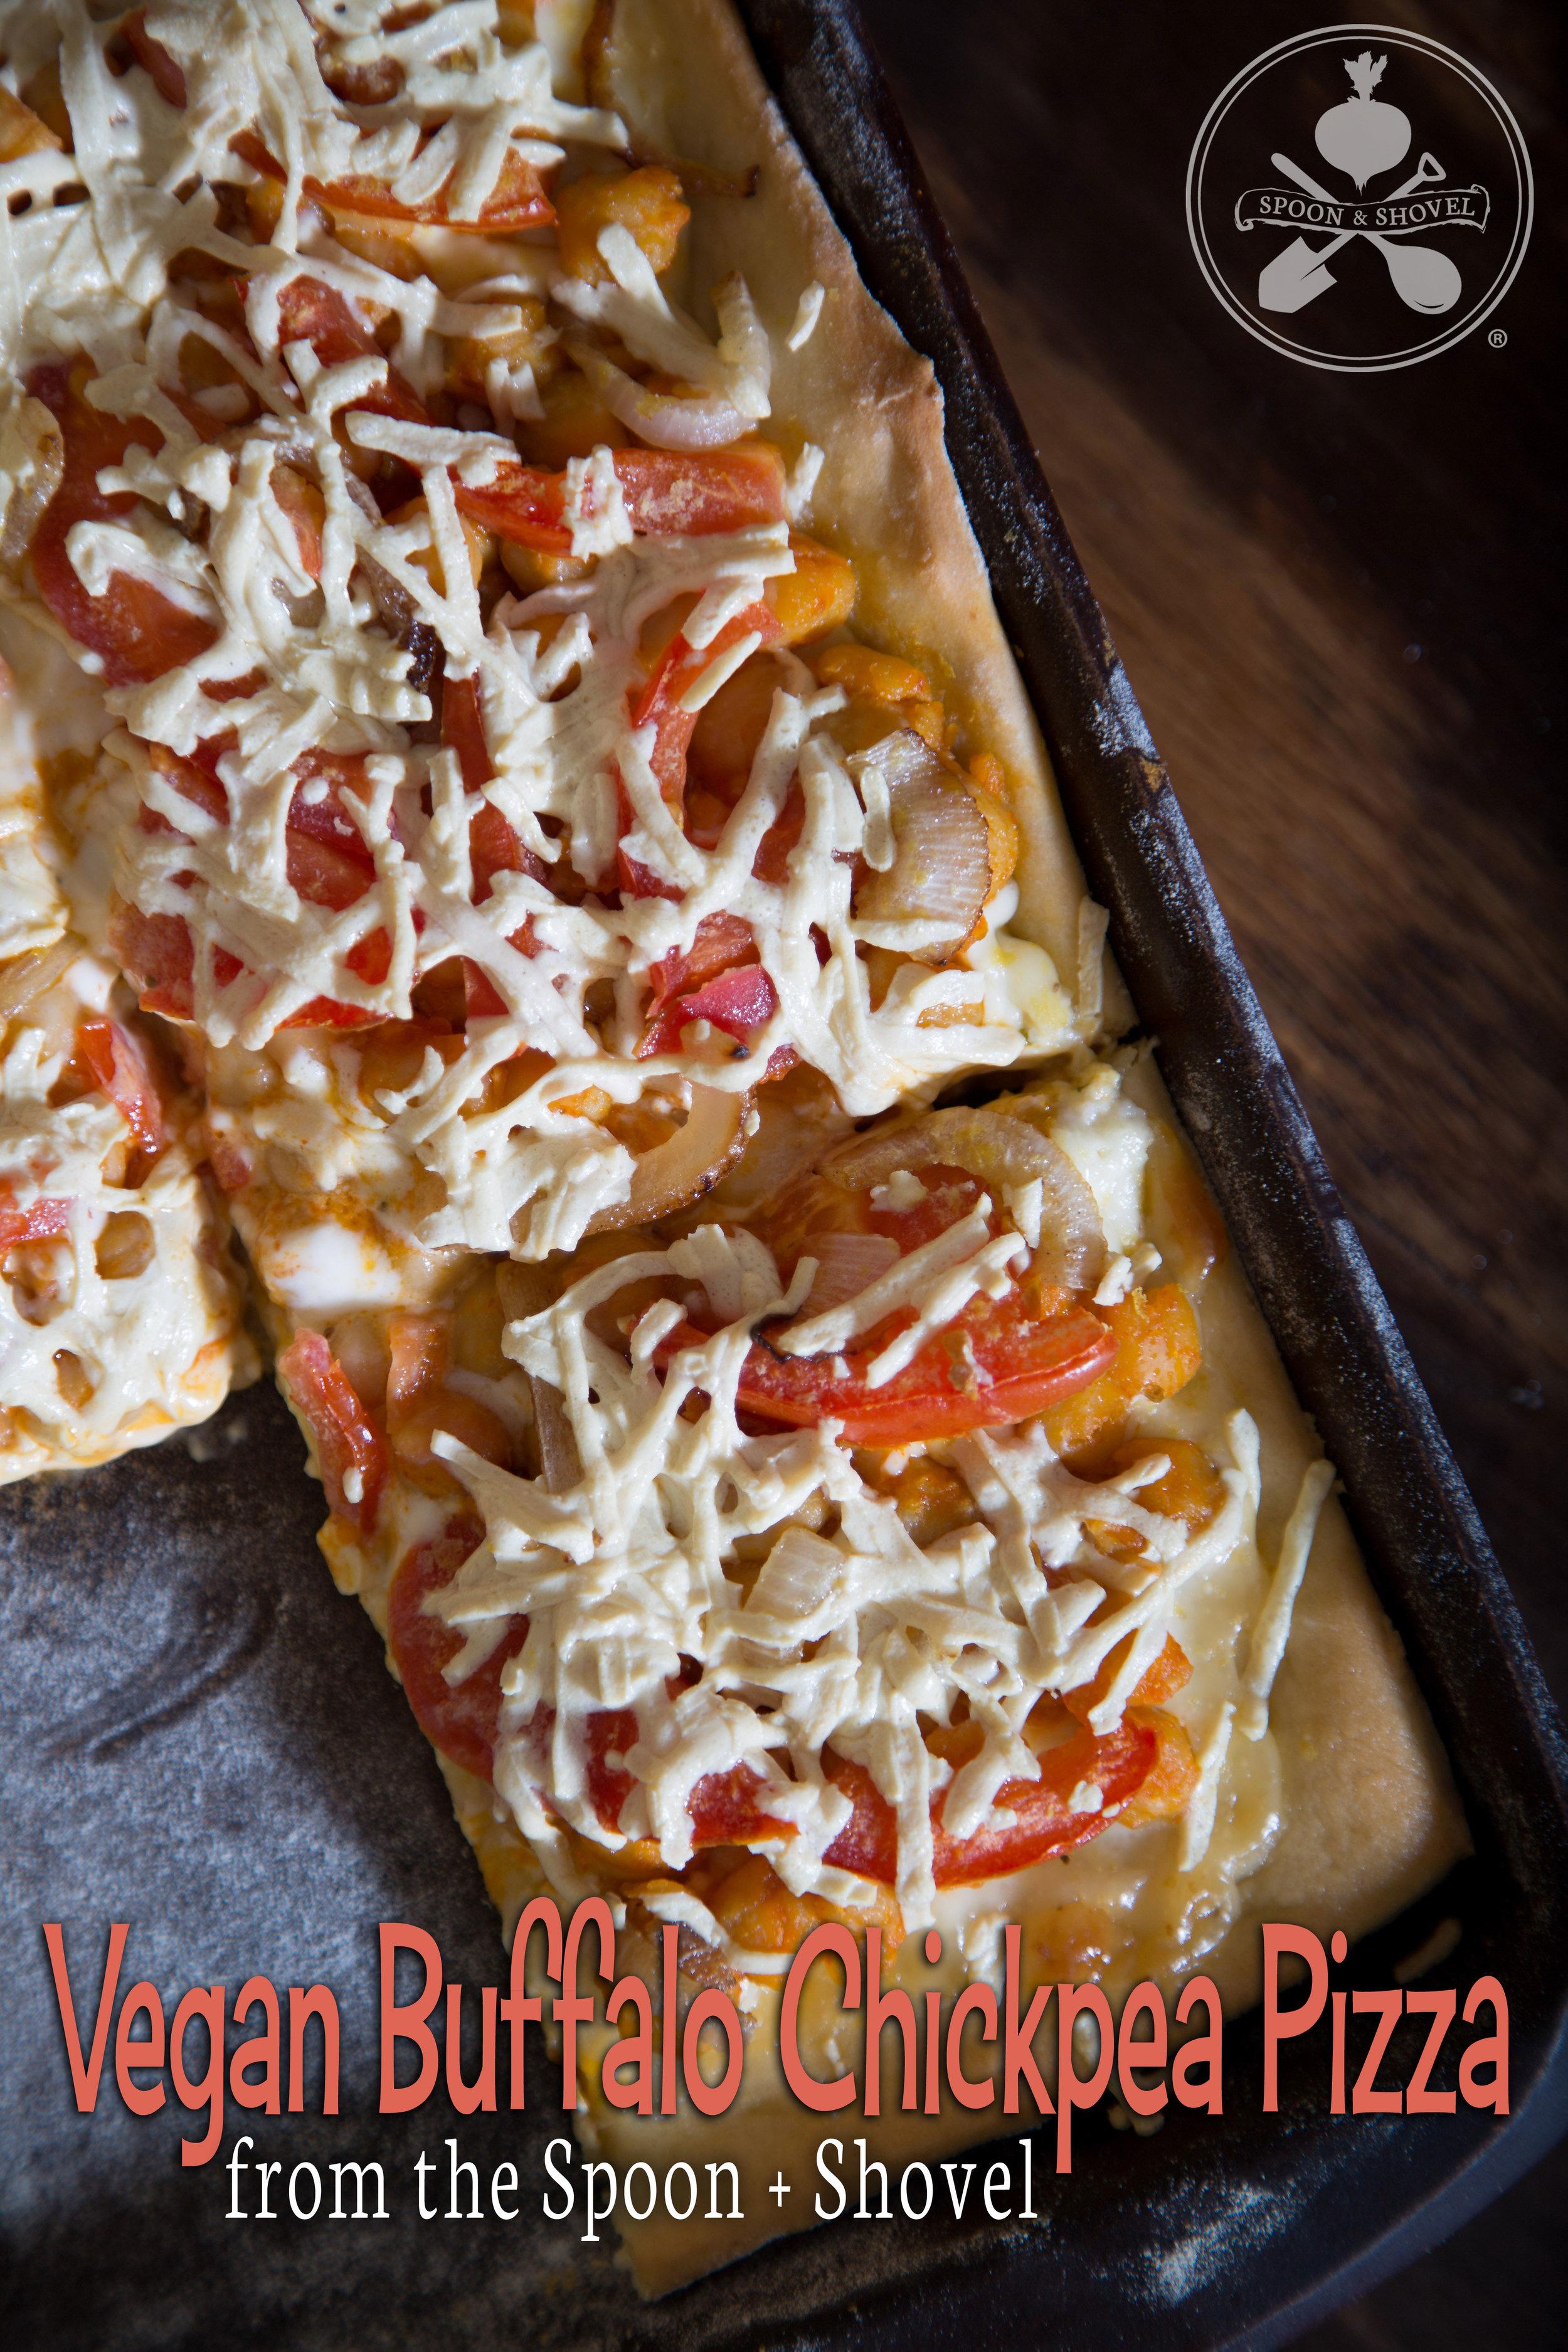 Vegan buffalo chickpea pizza from The Spoon + Shovel